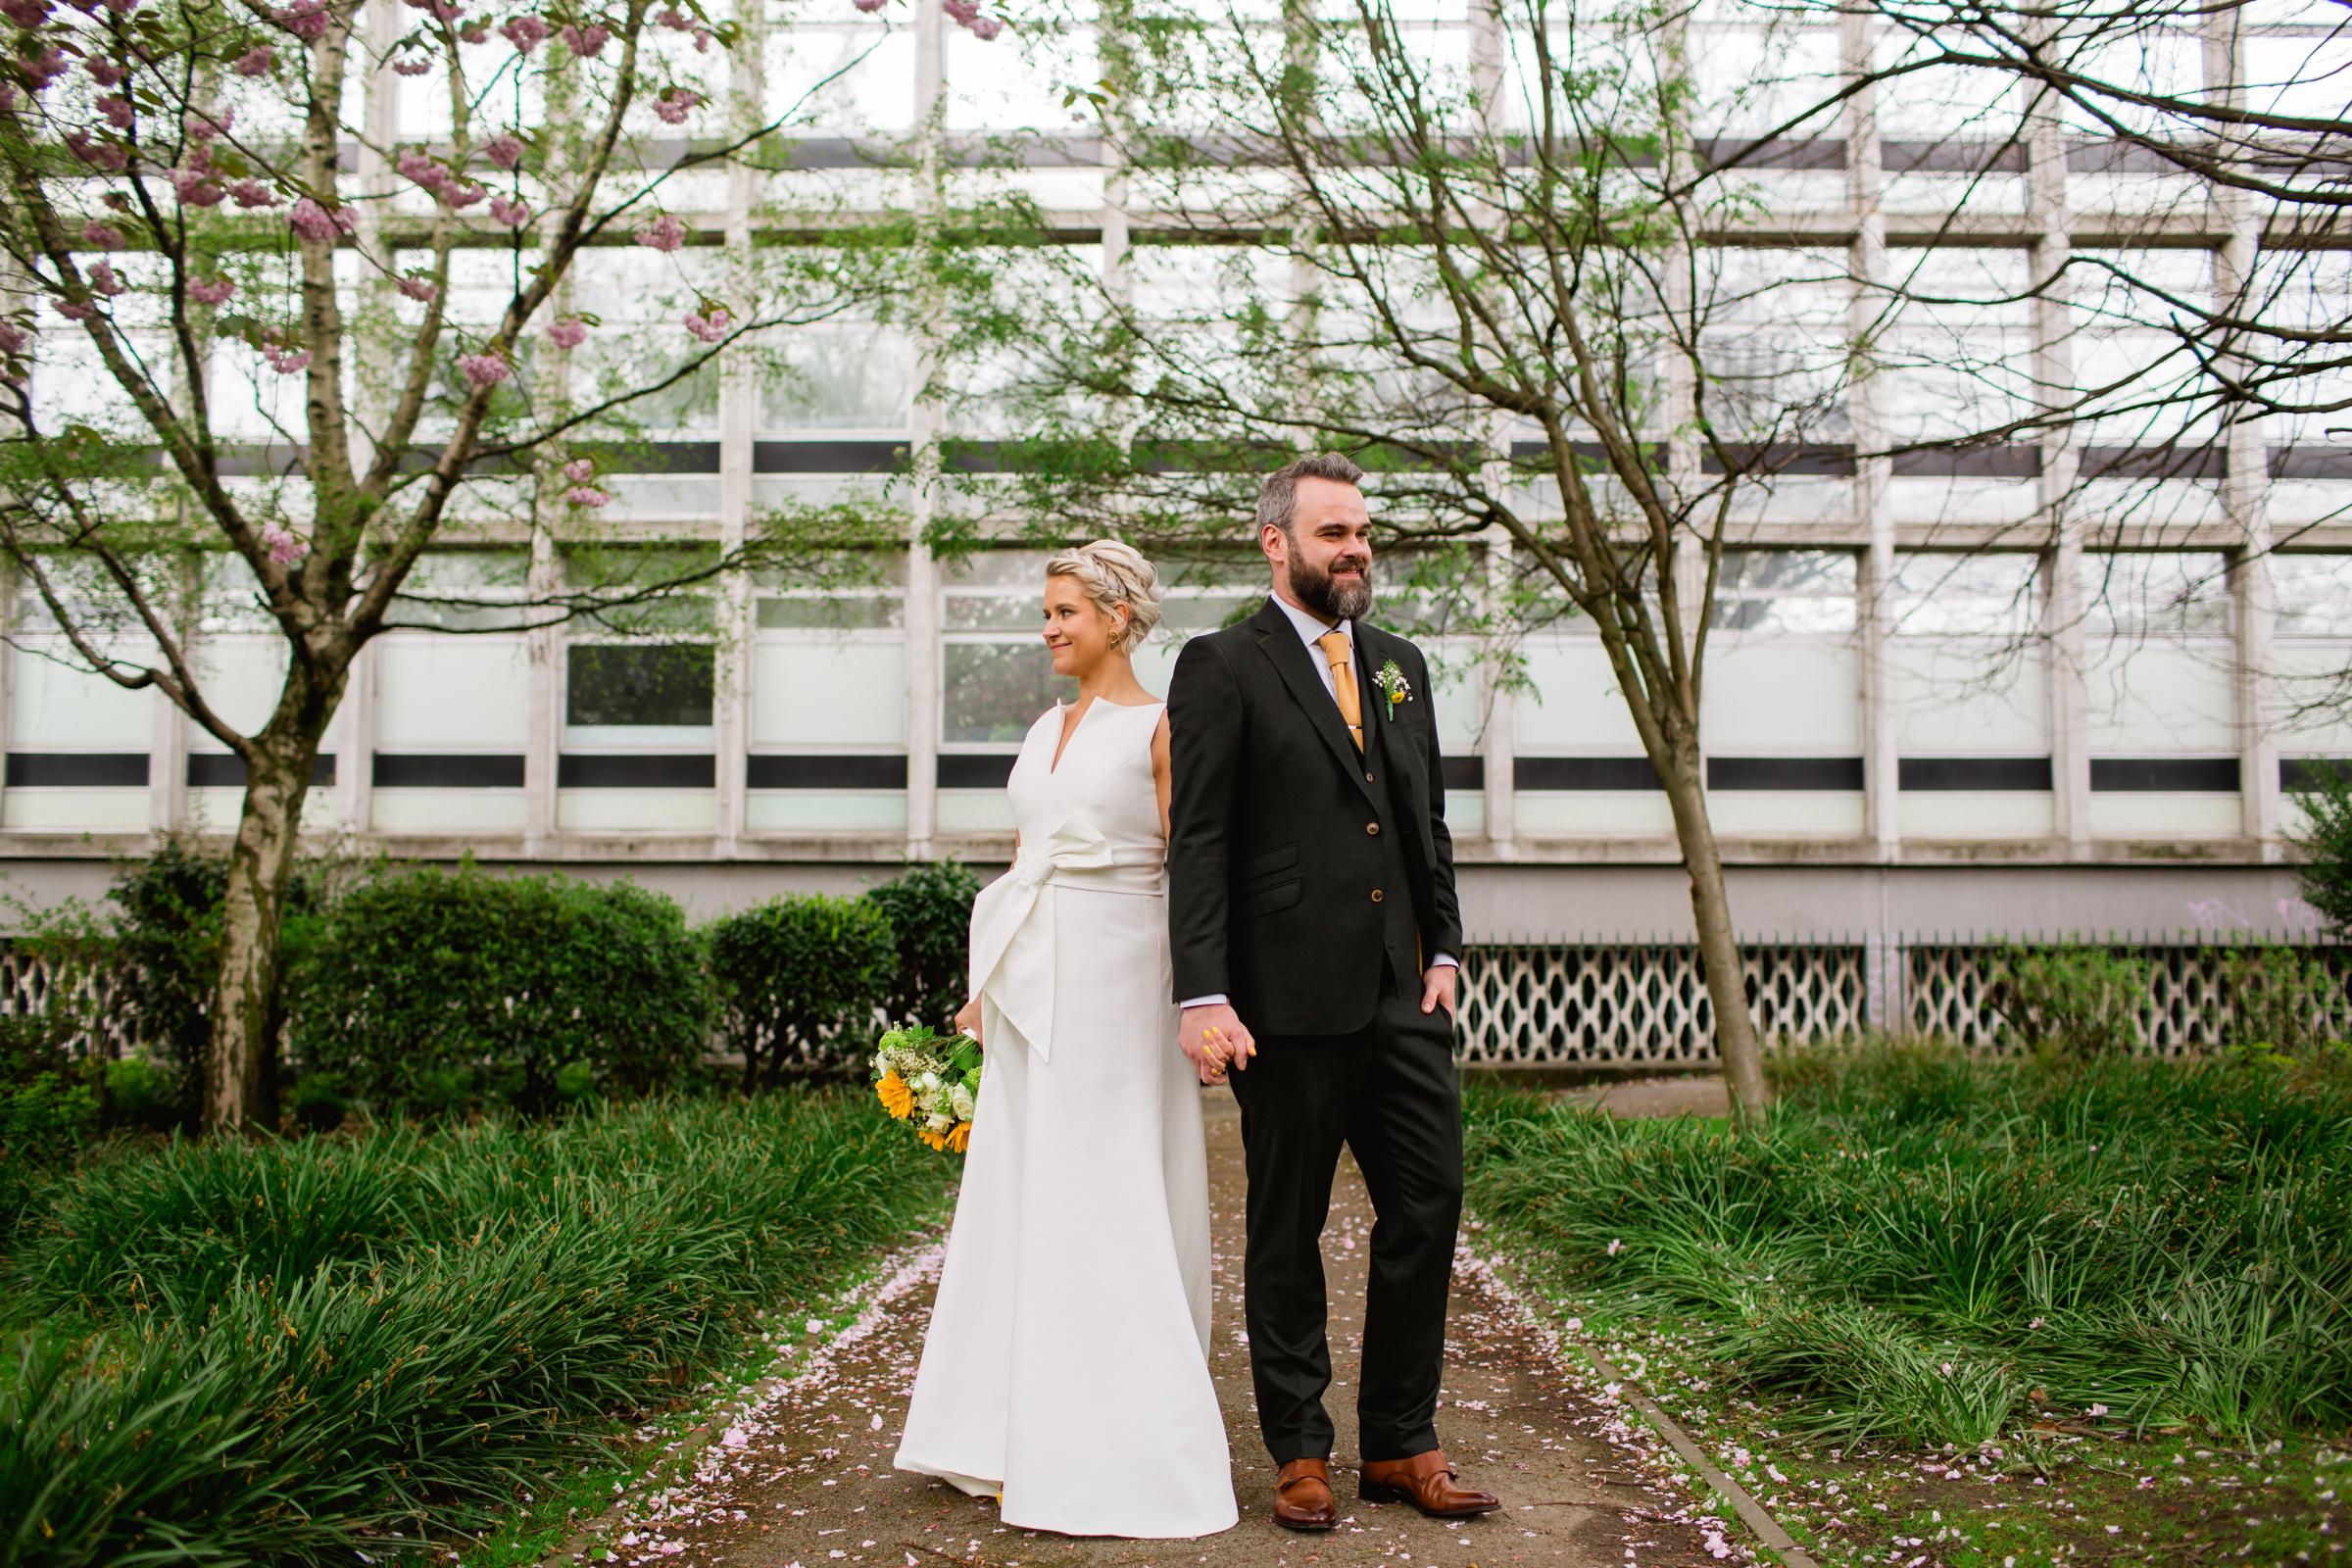 urban wedding portraits in manchester